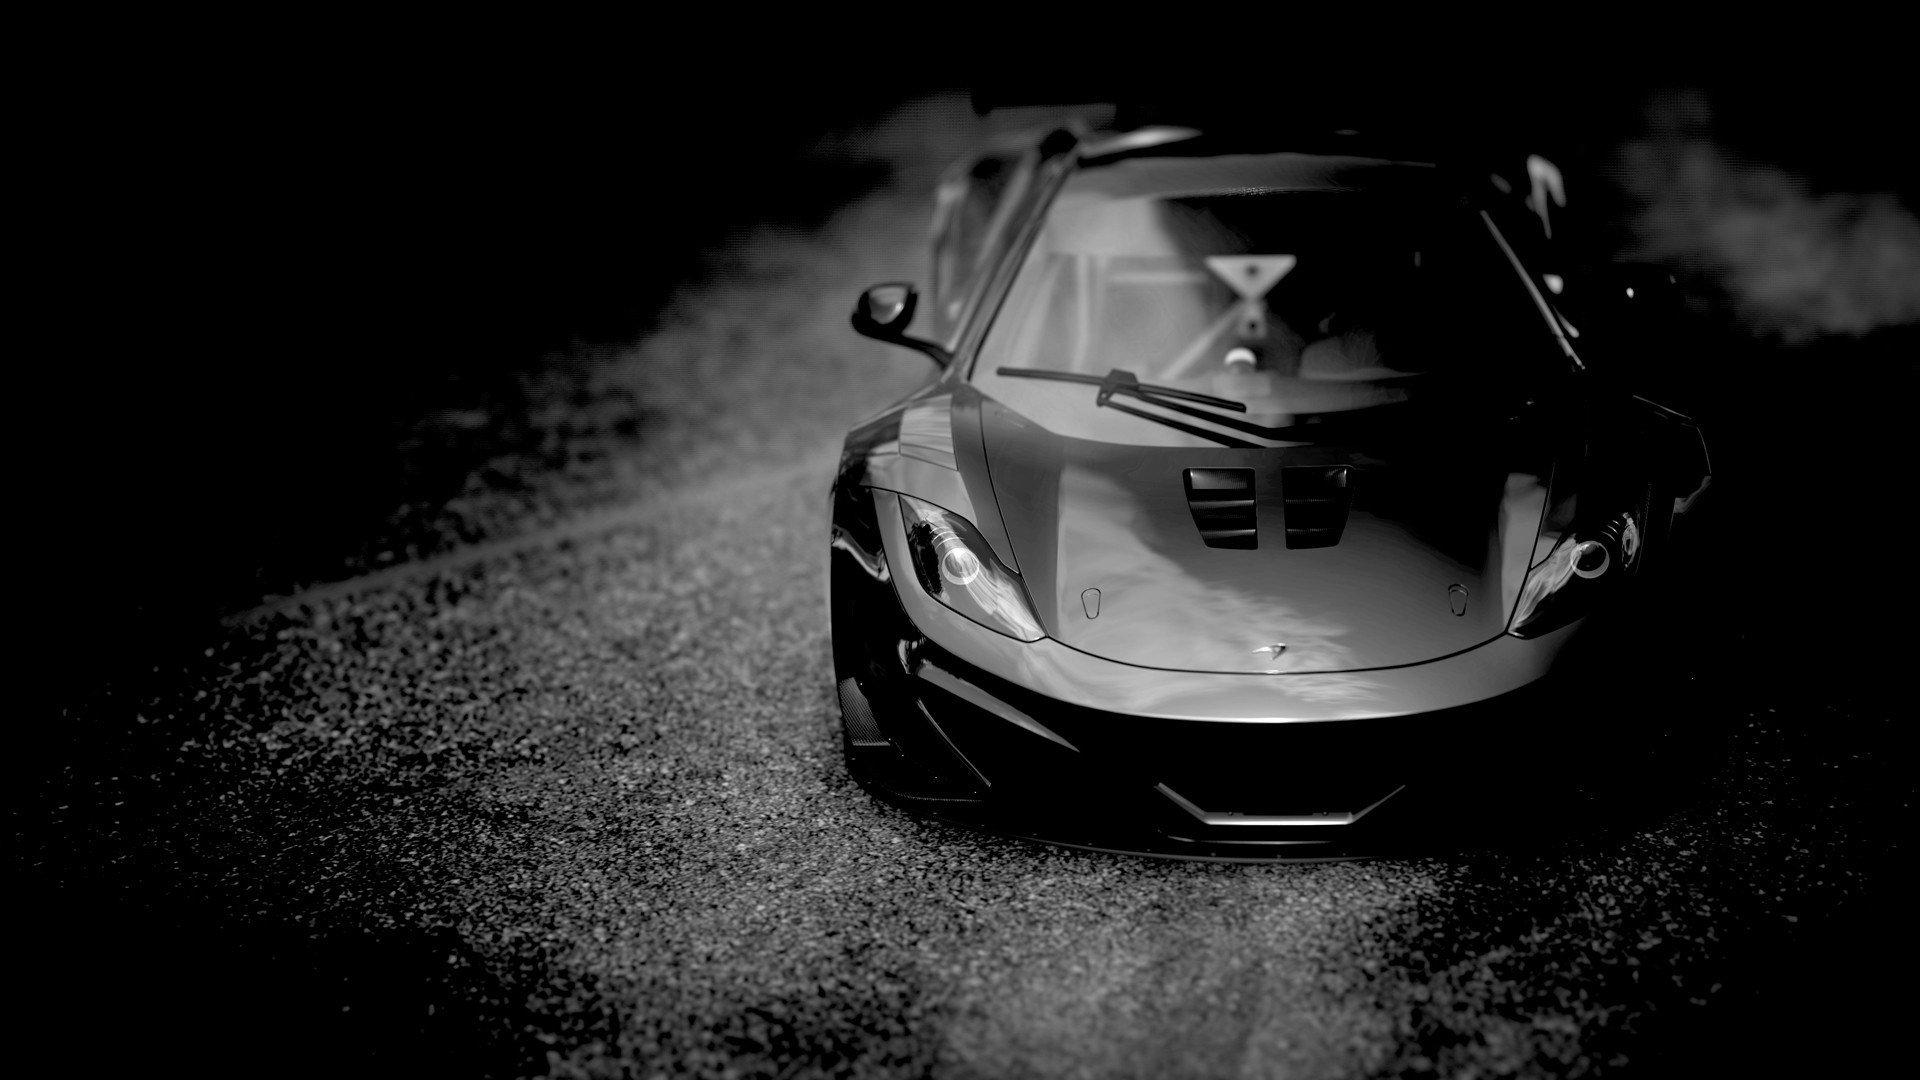 Mclaren Mp4 12c Black Cars Hd Wallpapers Desktop And Mobile Images Photos